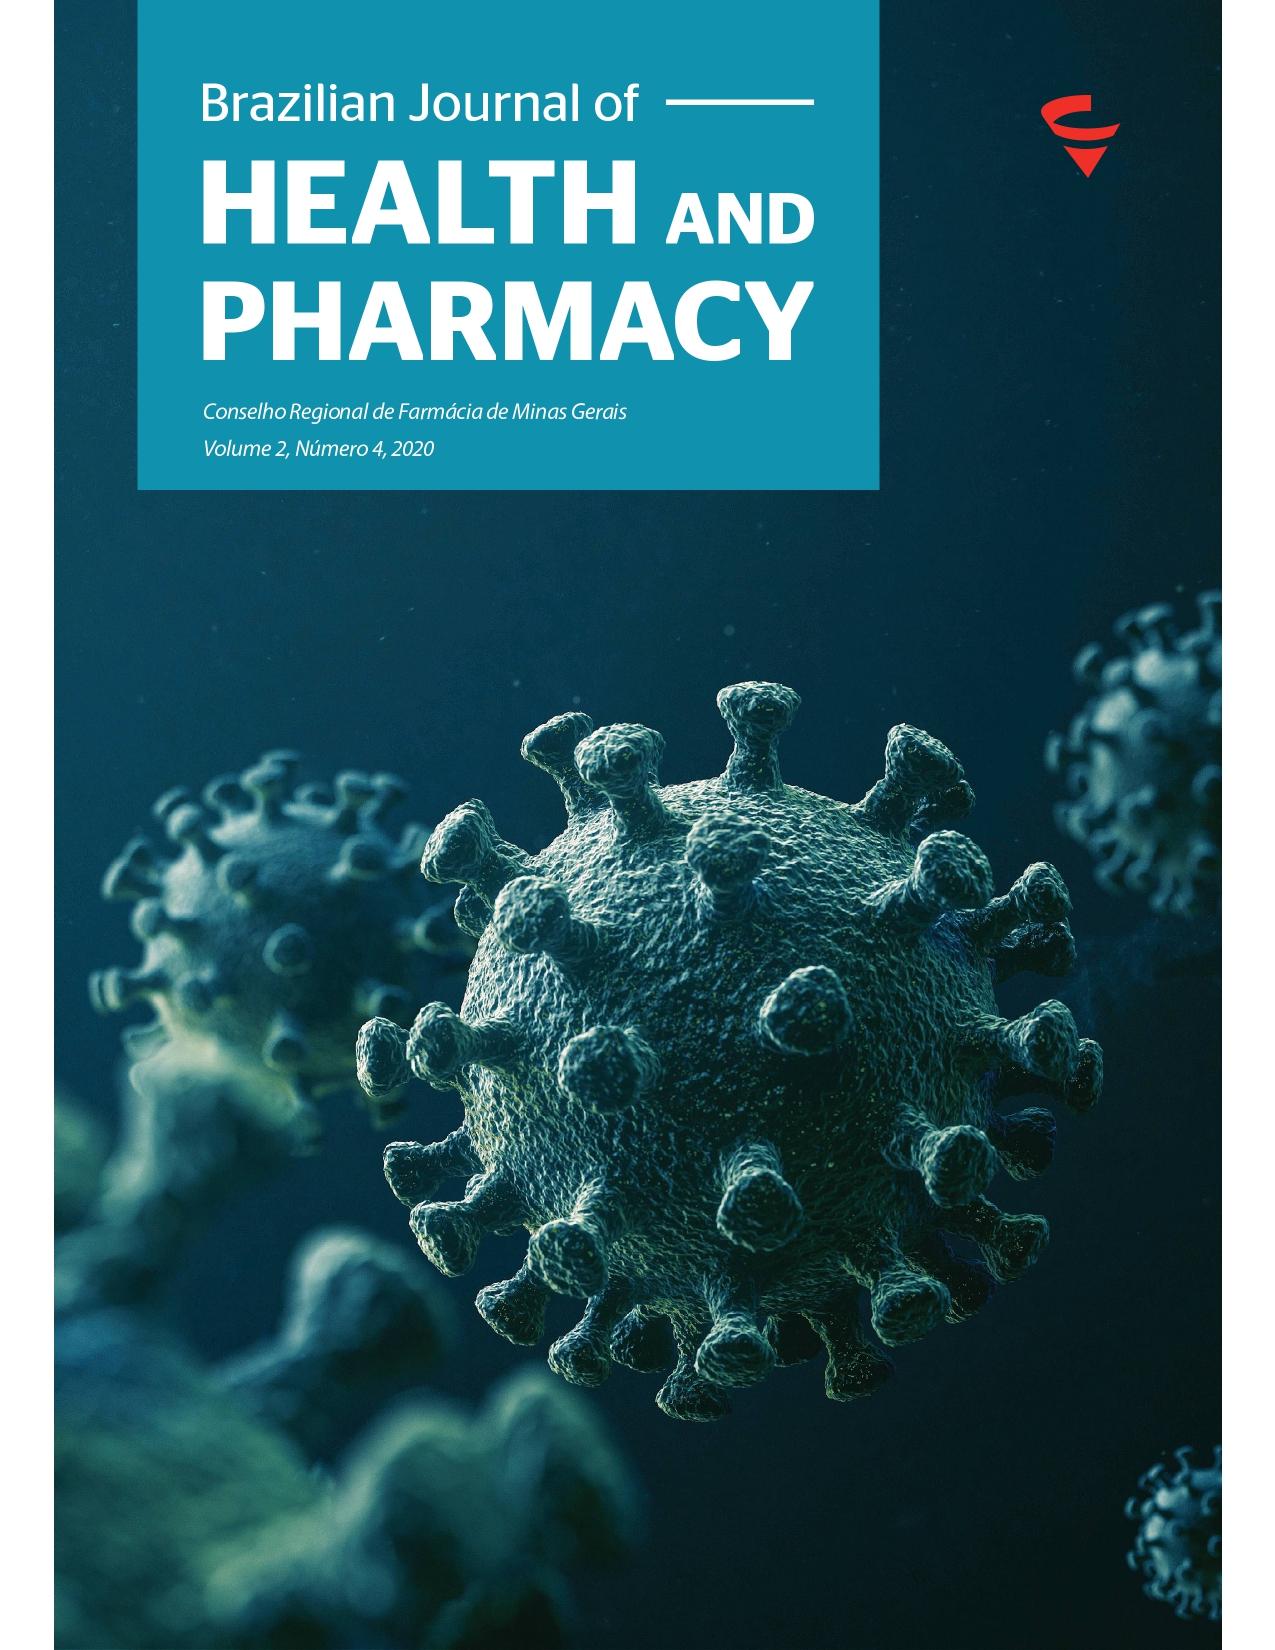 Capa Revista Cientifica BJHP V2 N4 2020